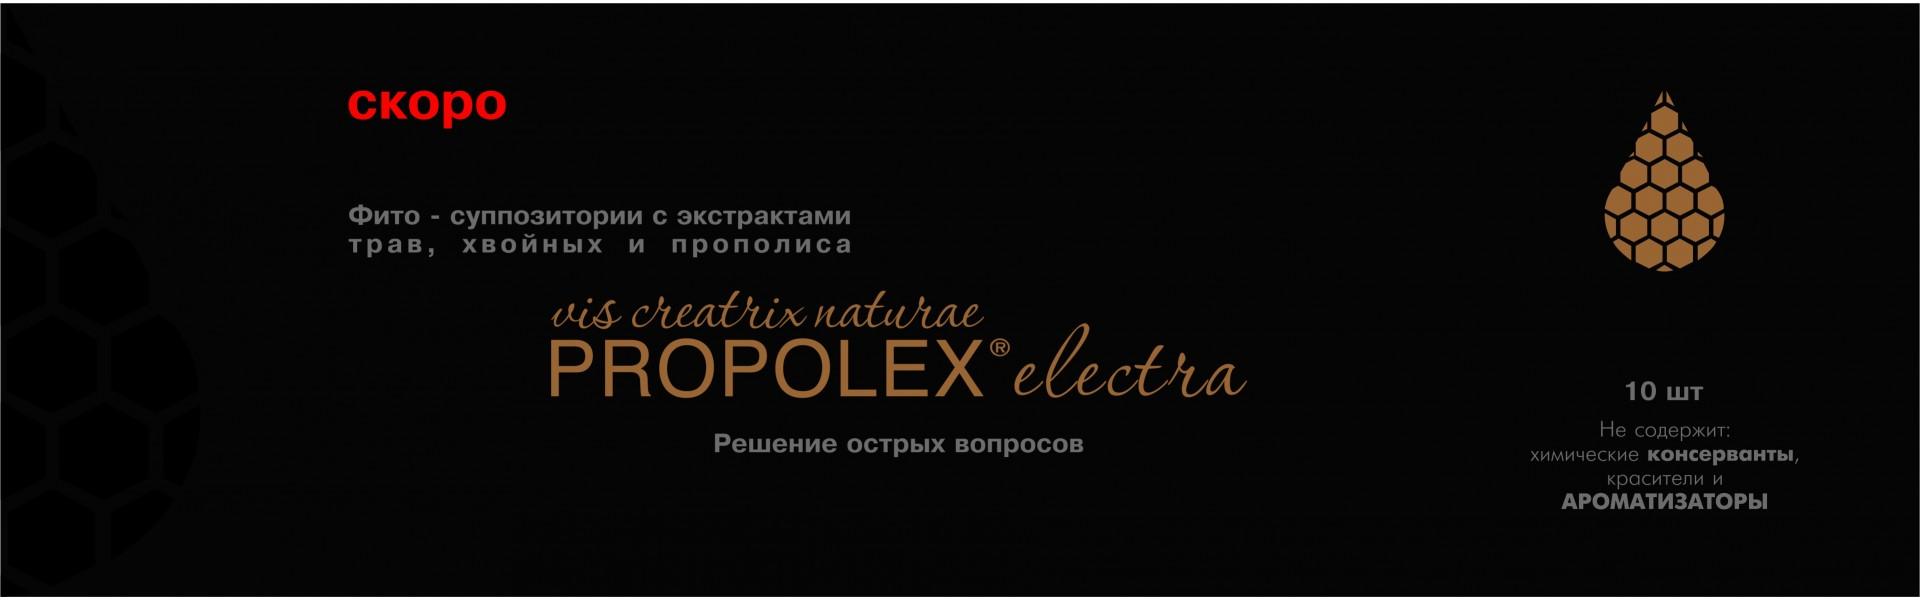 propolex electra